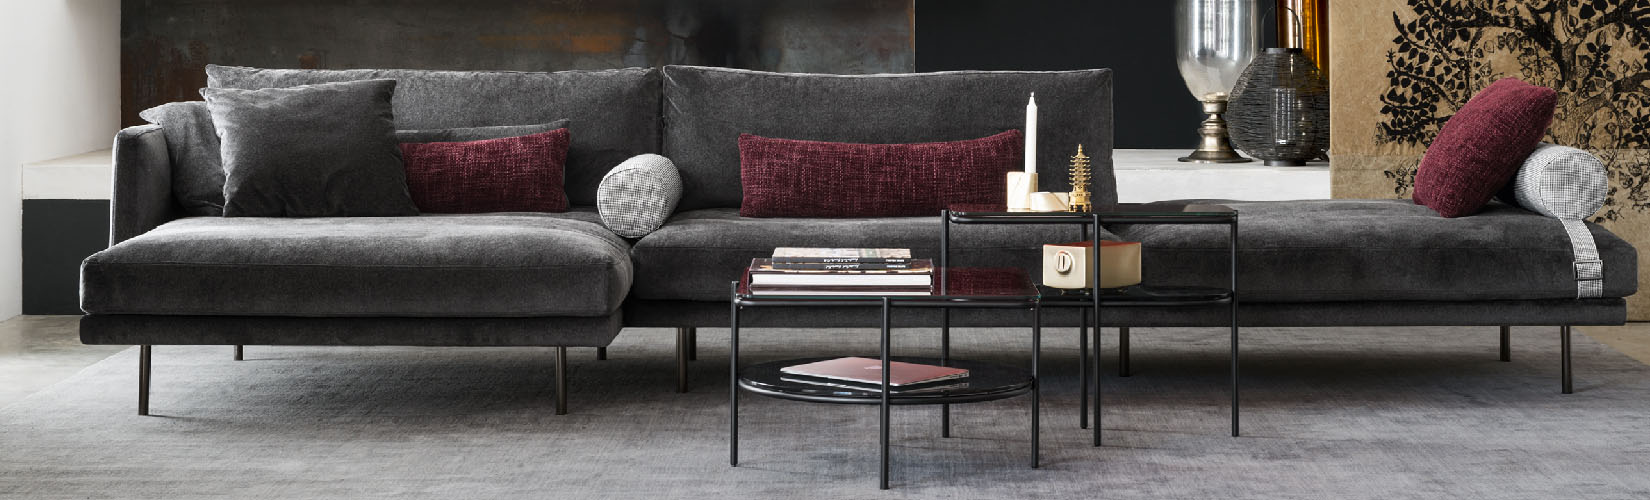 Top Home Interior Design Trends 2019